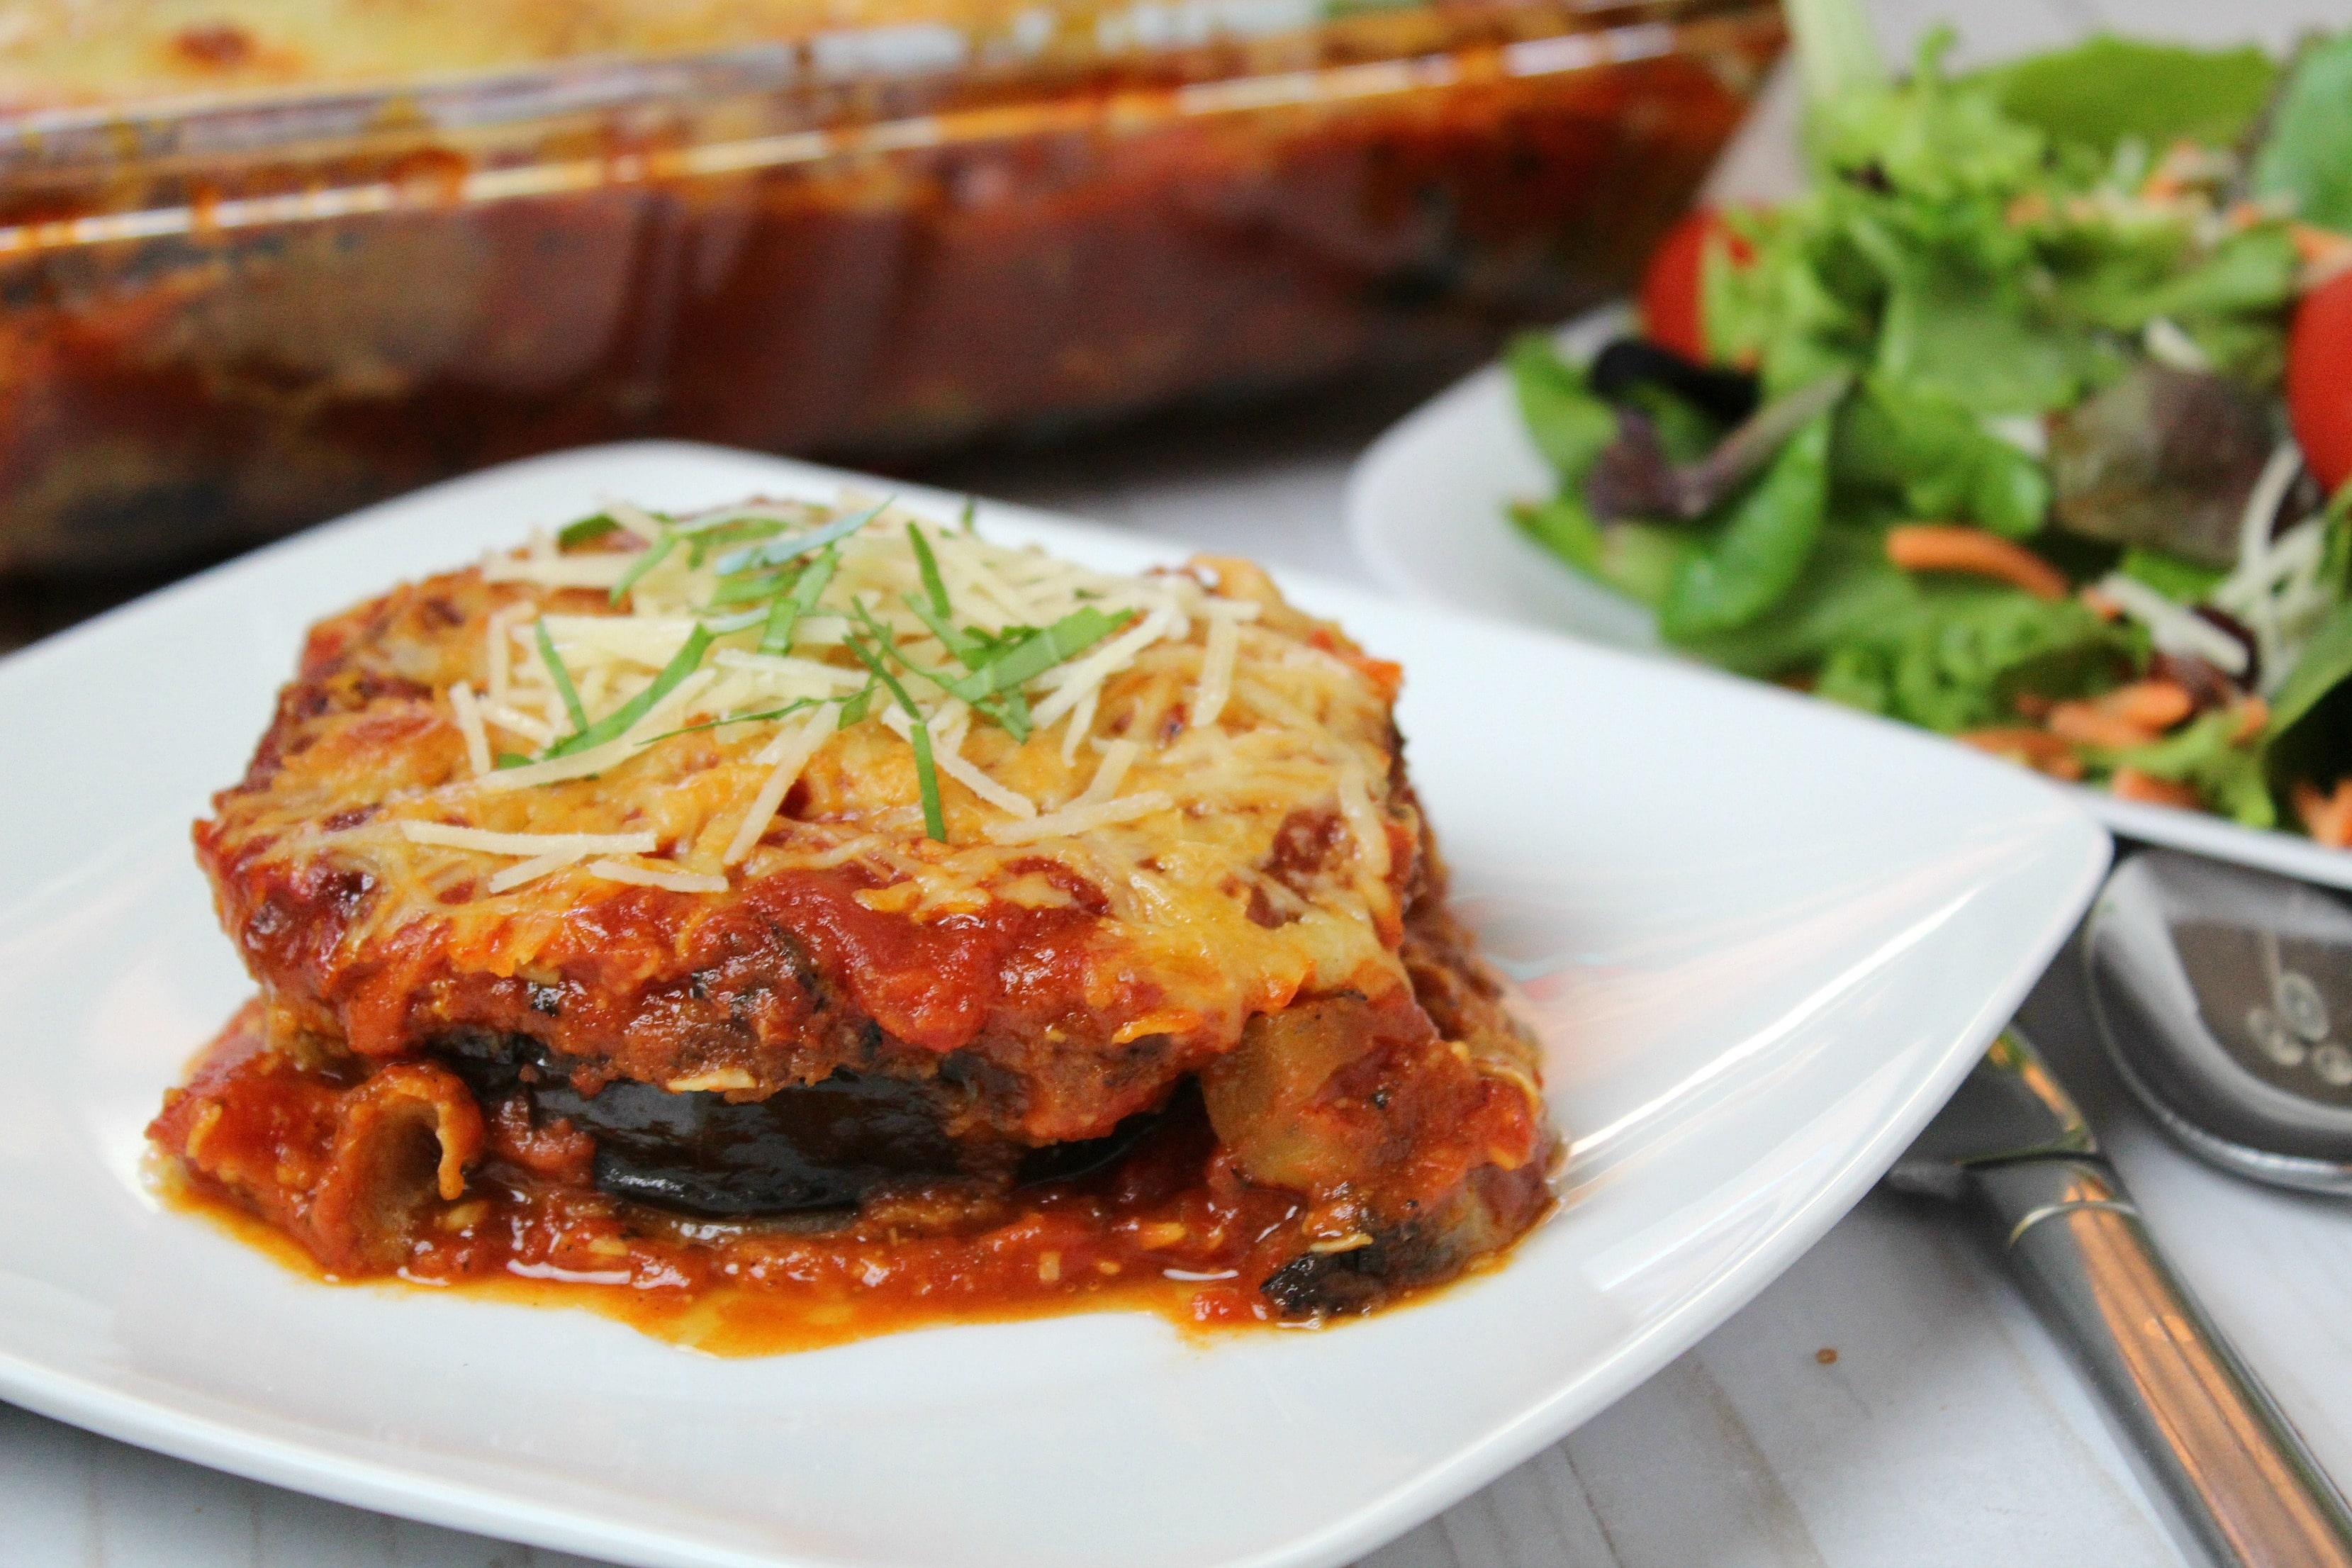 Easy Eggplant Parmesan | Baked Eggplant Recipe | Baked Eggplant Parmesan Recipe | Easy Eggplant Parmesan